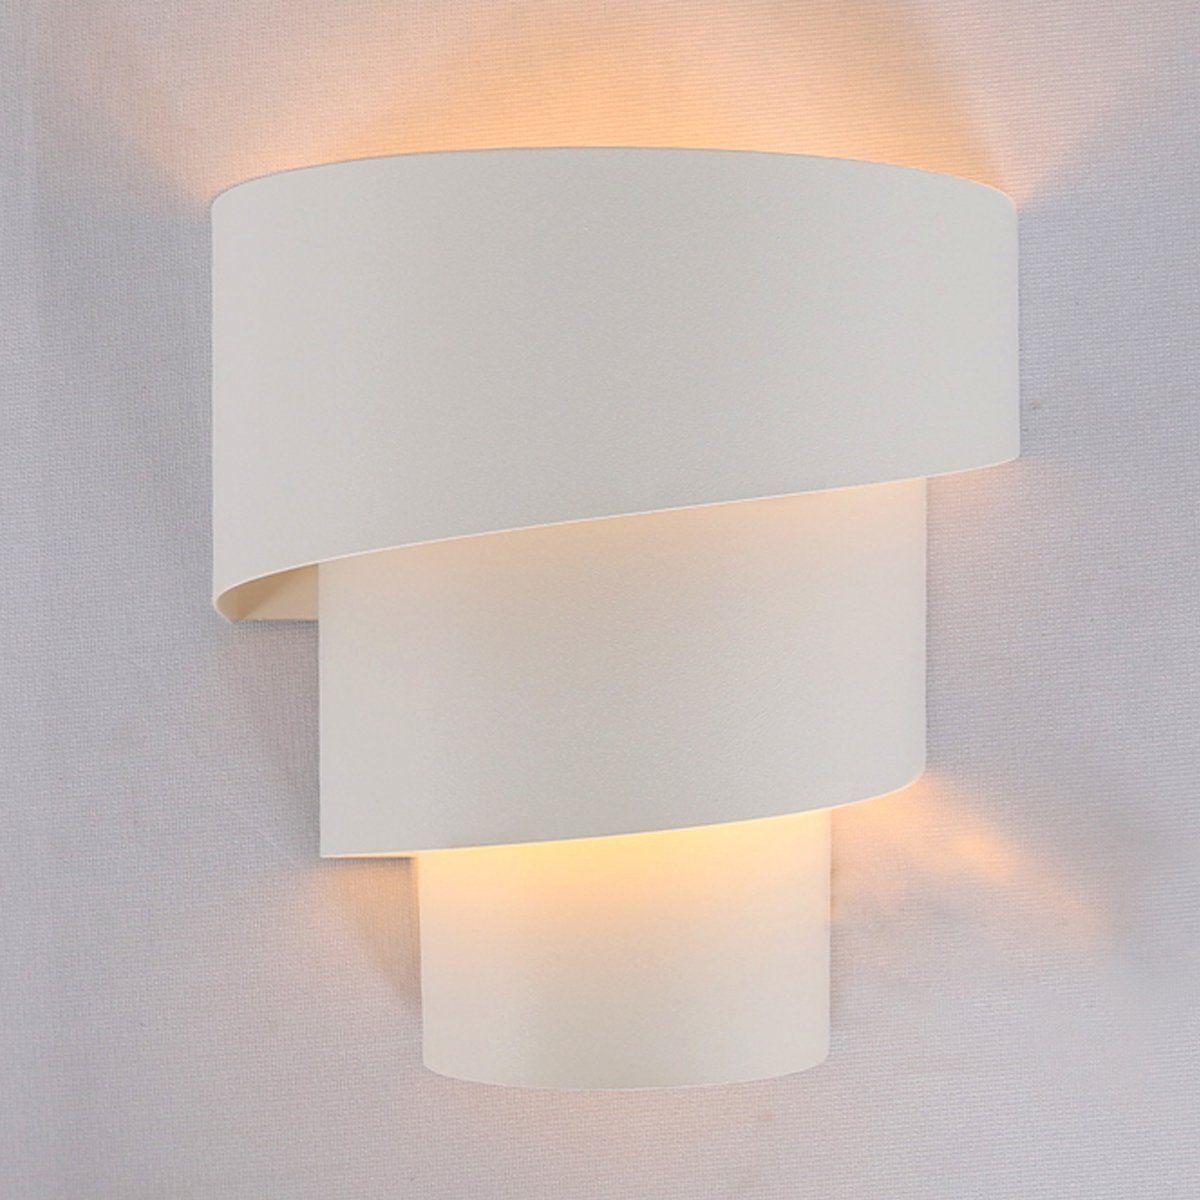 Lightess Apliques De Pared Moderna Lampara De Pared Lampara En Moda Agradable Luz De Ambiente Lampara D Lampara De Pared Apliques De Pared Iluminacion De Pared